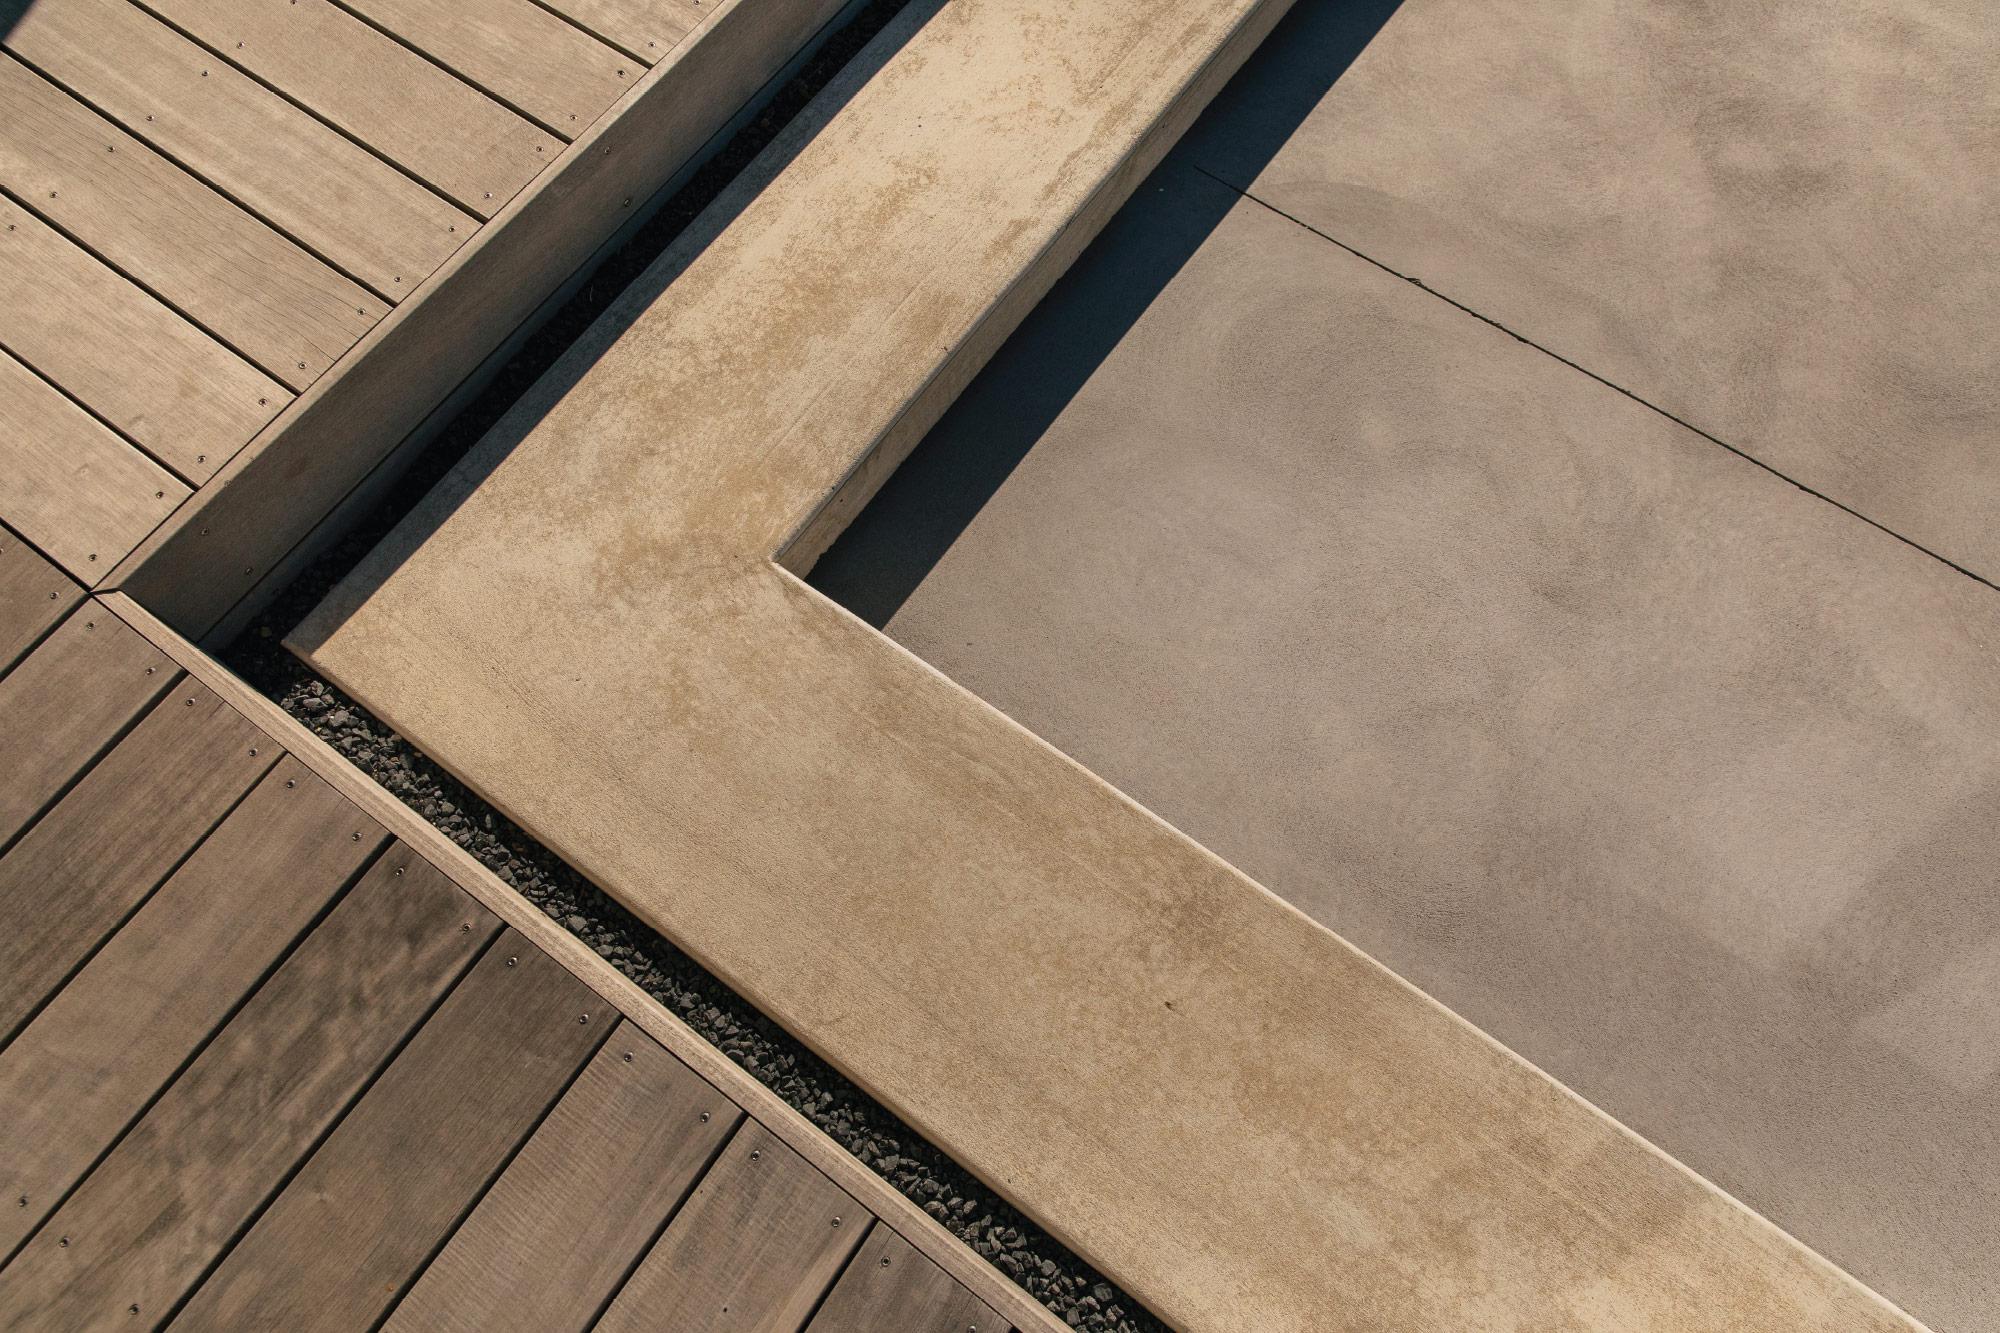 xs-akaroa-gallery-2000x1333-5.jpg